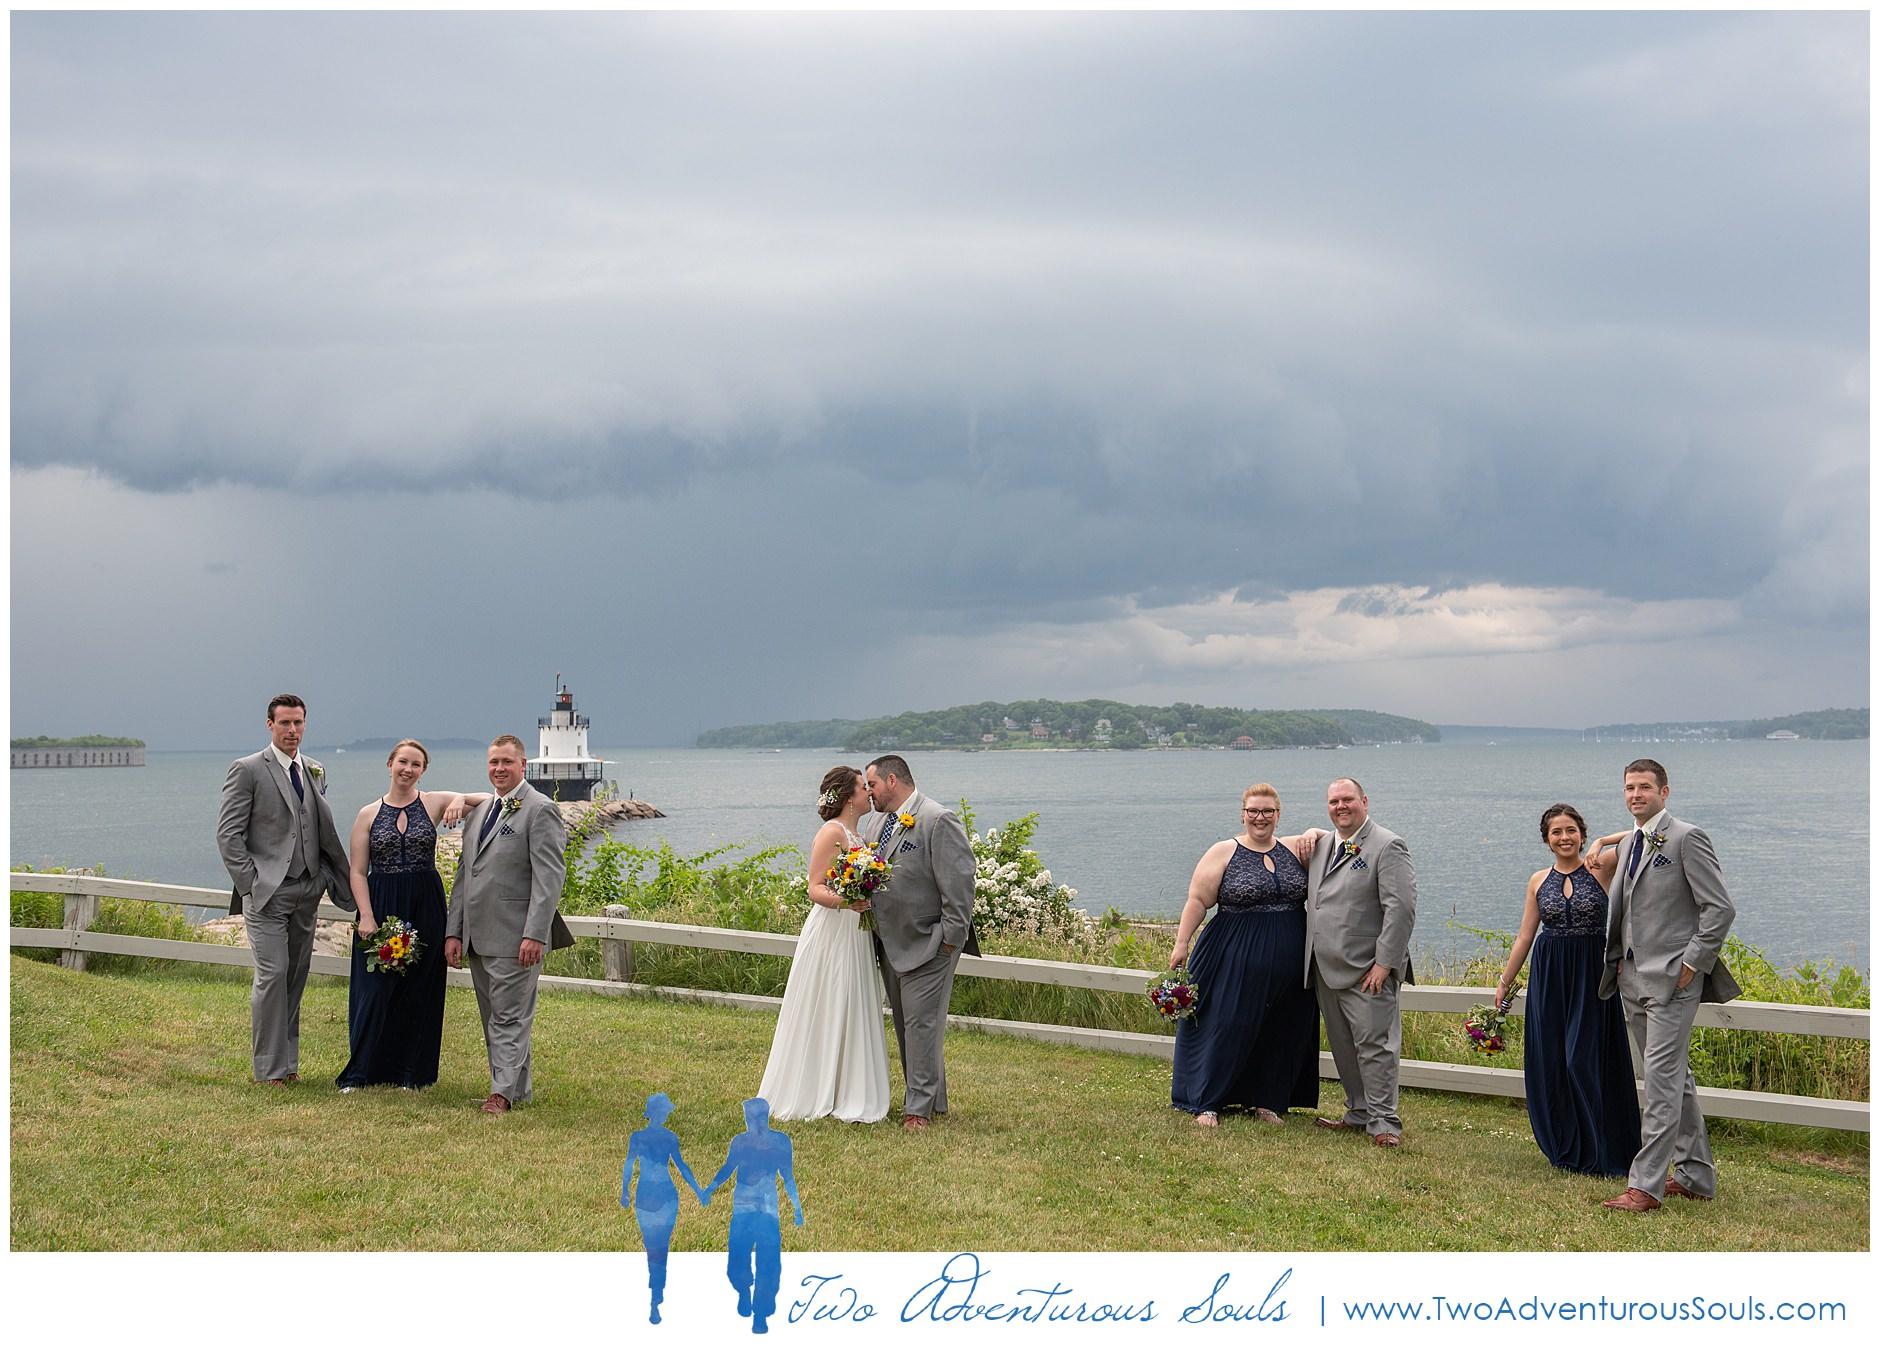 Maine Wedding Photographers, SMCC Wedding Photographers, Southern Maine Community College Wedding Photographers, Two Adventurous Souls-AshleyAaron_0033.jpg